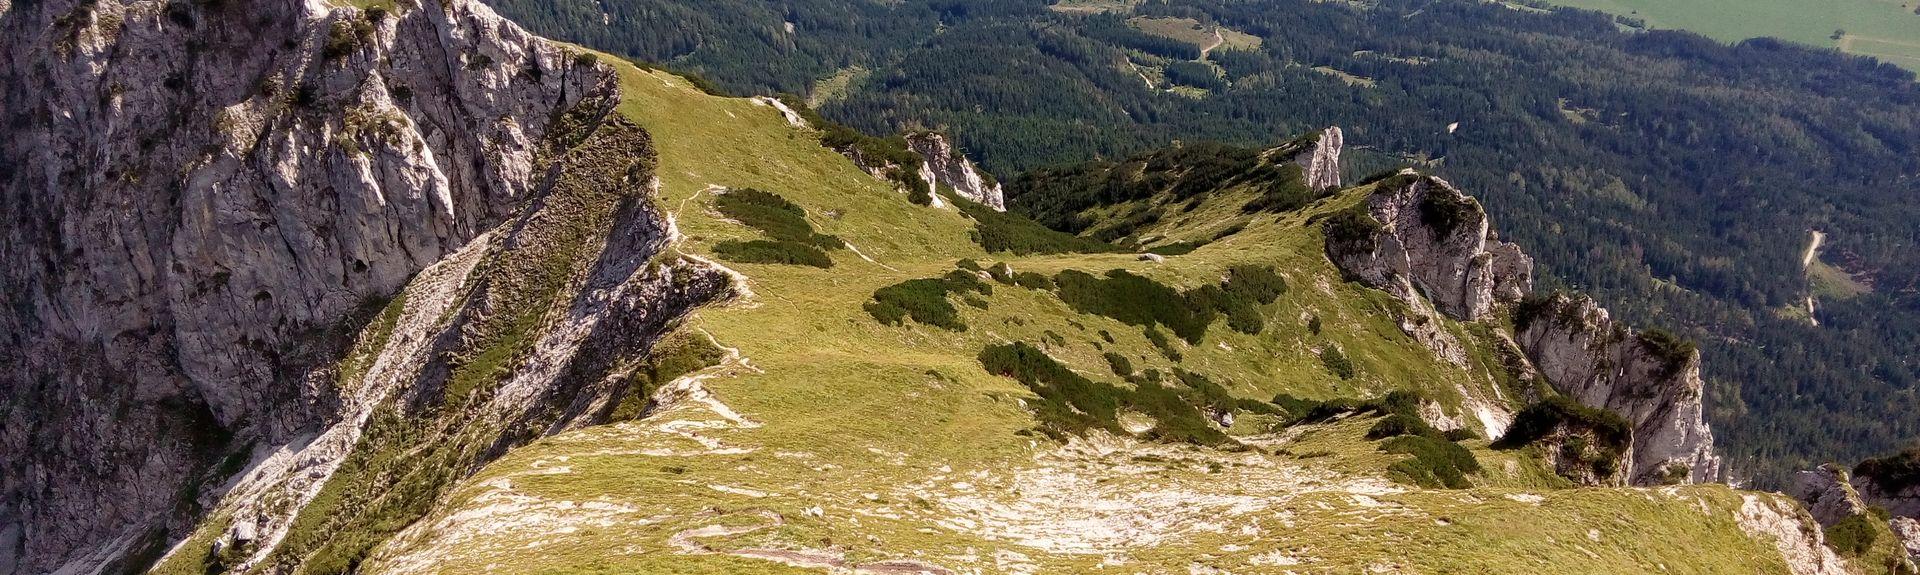 Hoefi-Express I Ski Lift, Haus, Steiermark, Styria, Austria